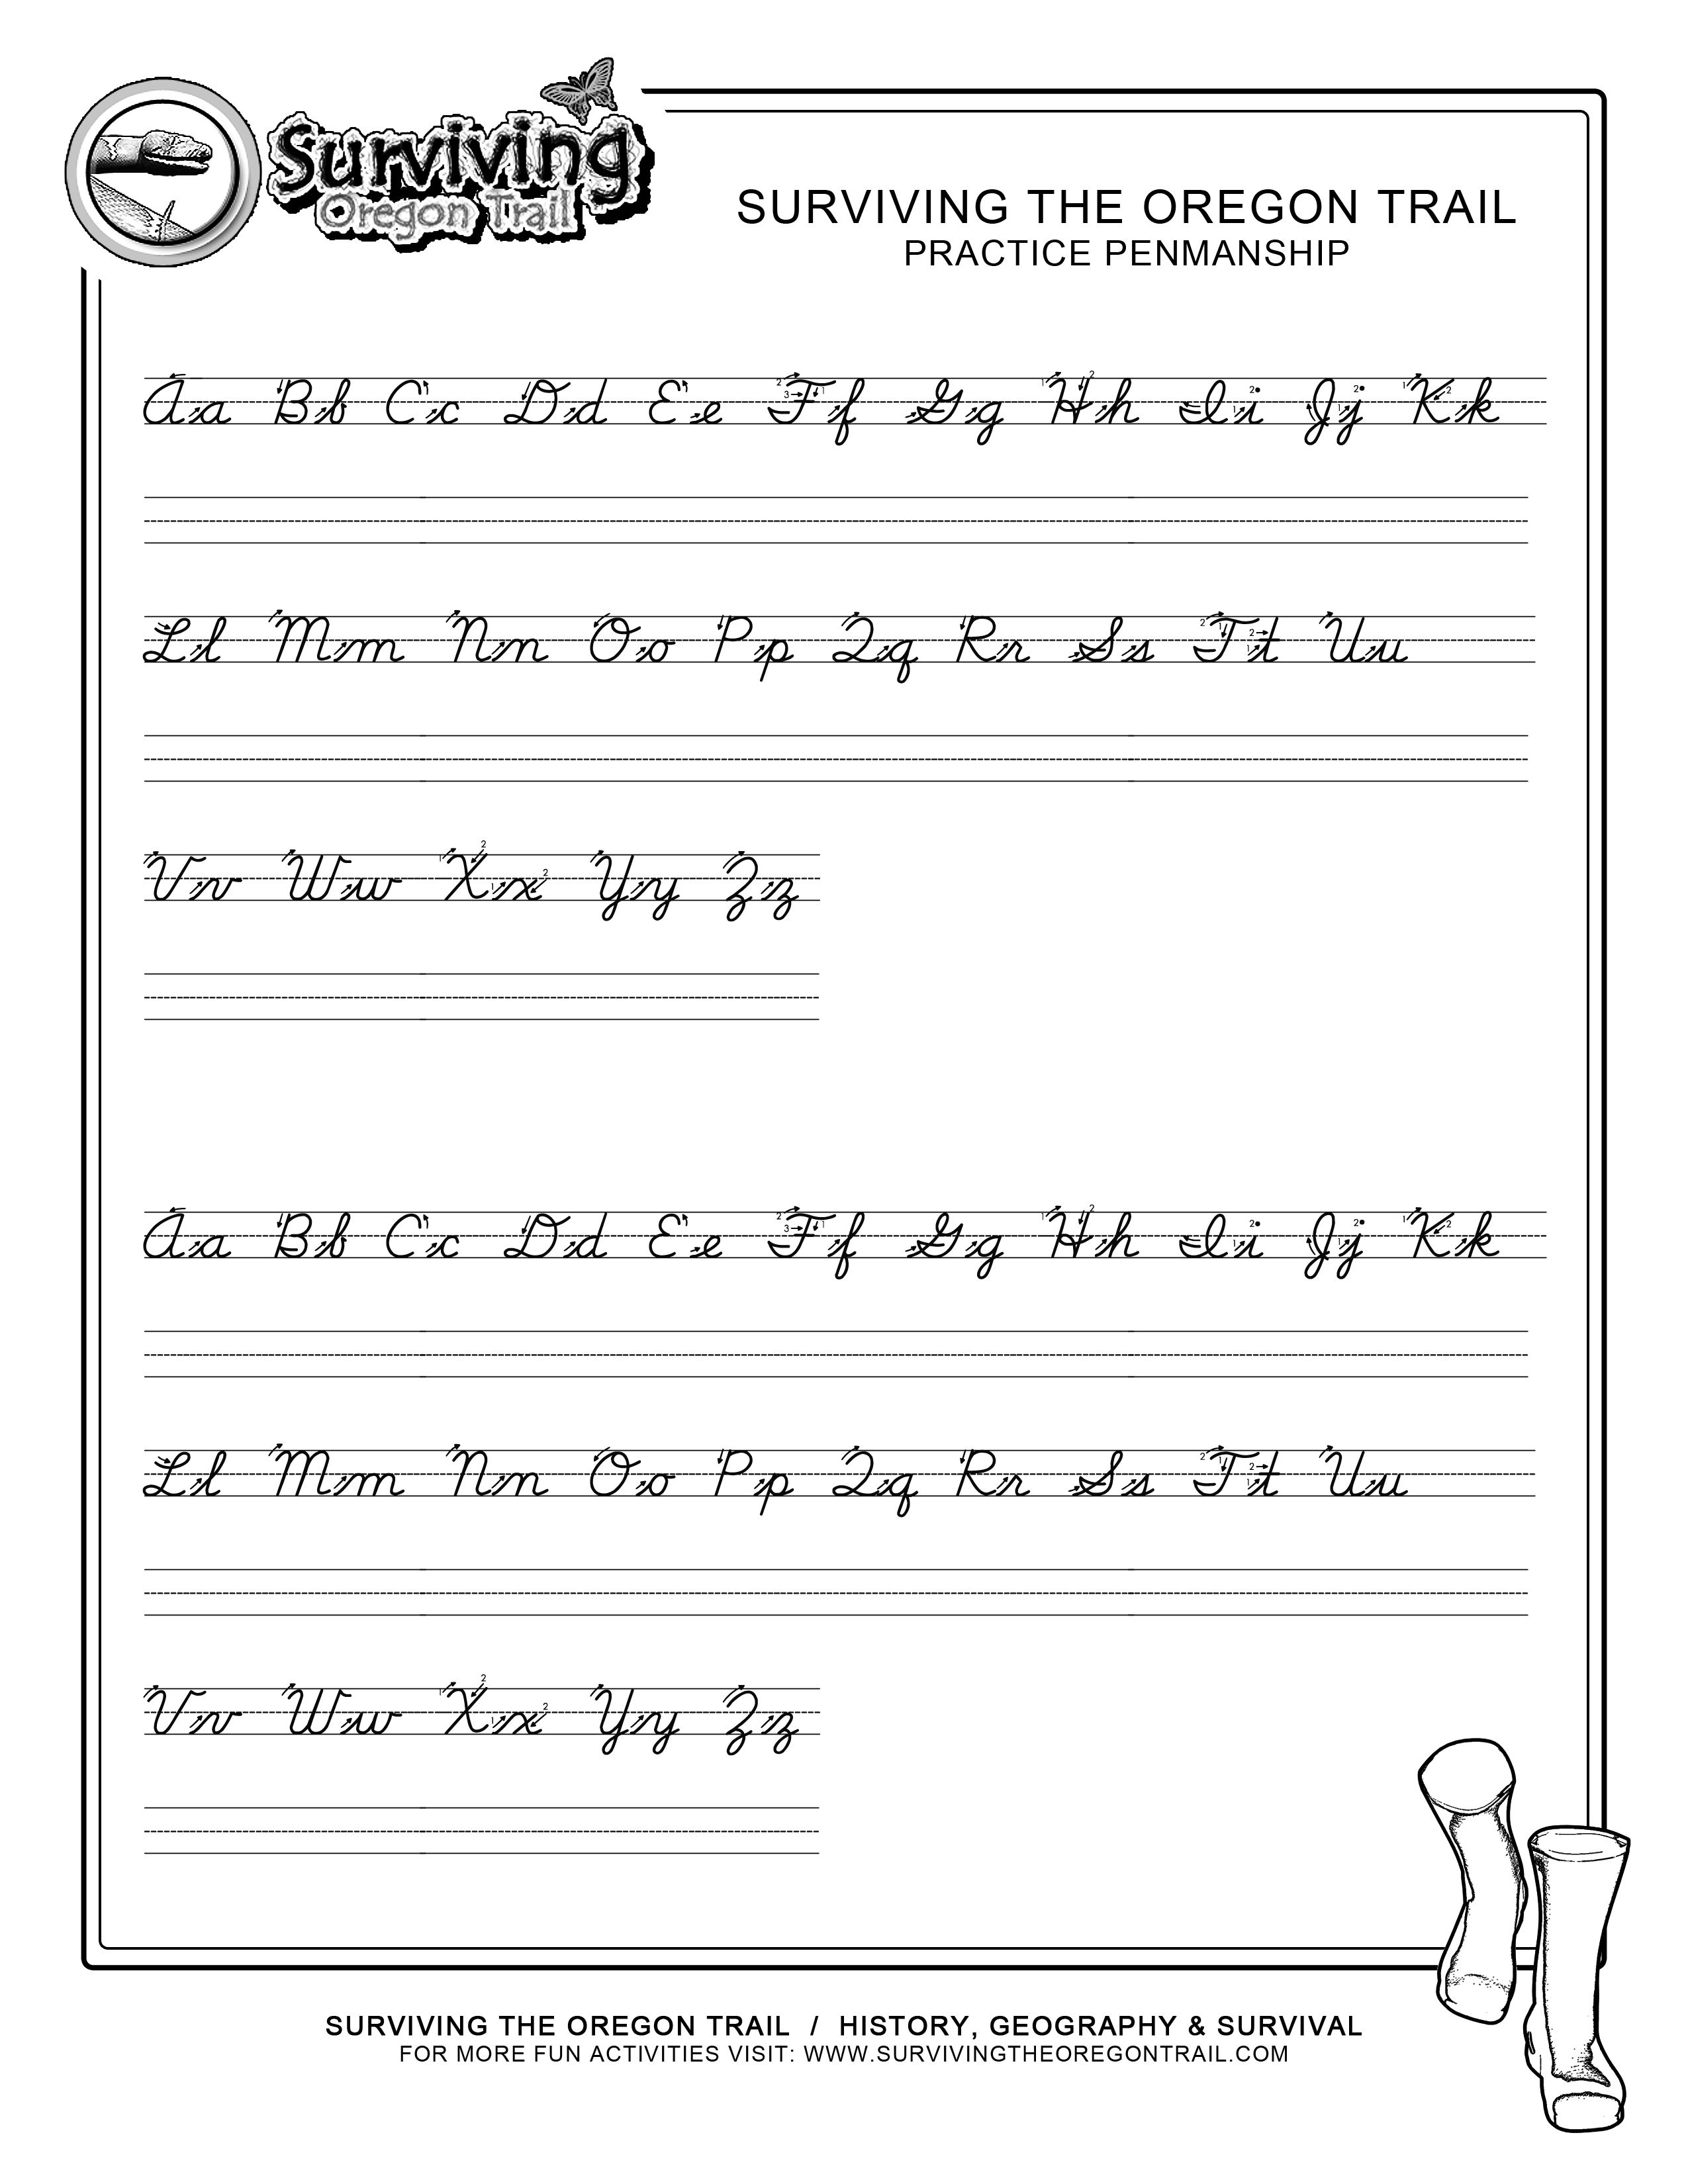 Practice Penmanship – Free Abc's Printable Cursive Writing Worksheet - Free Printable Cursive Practice